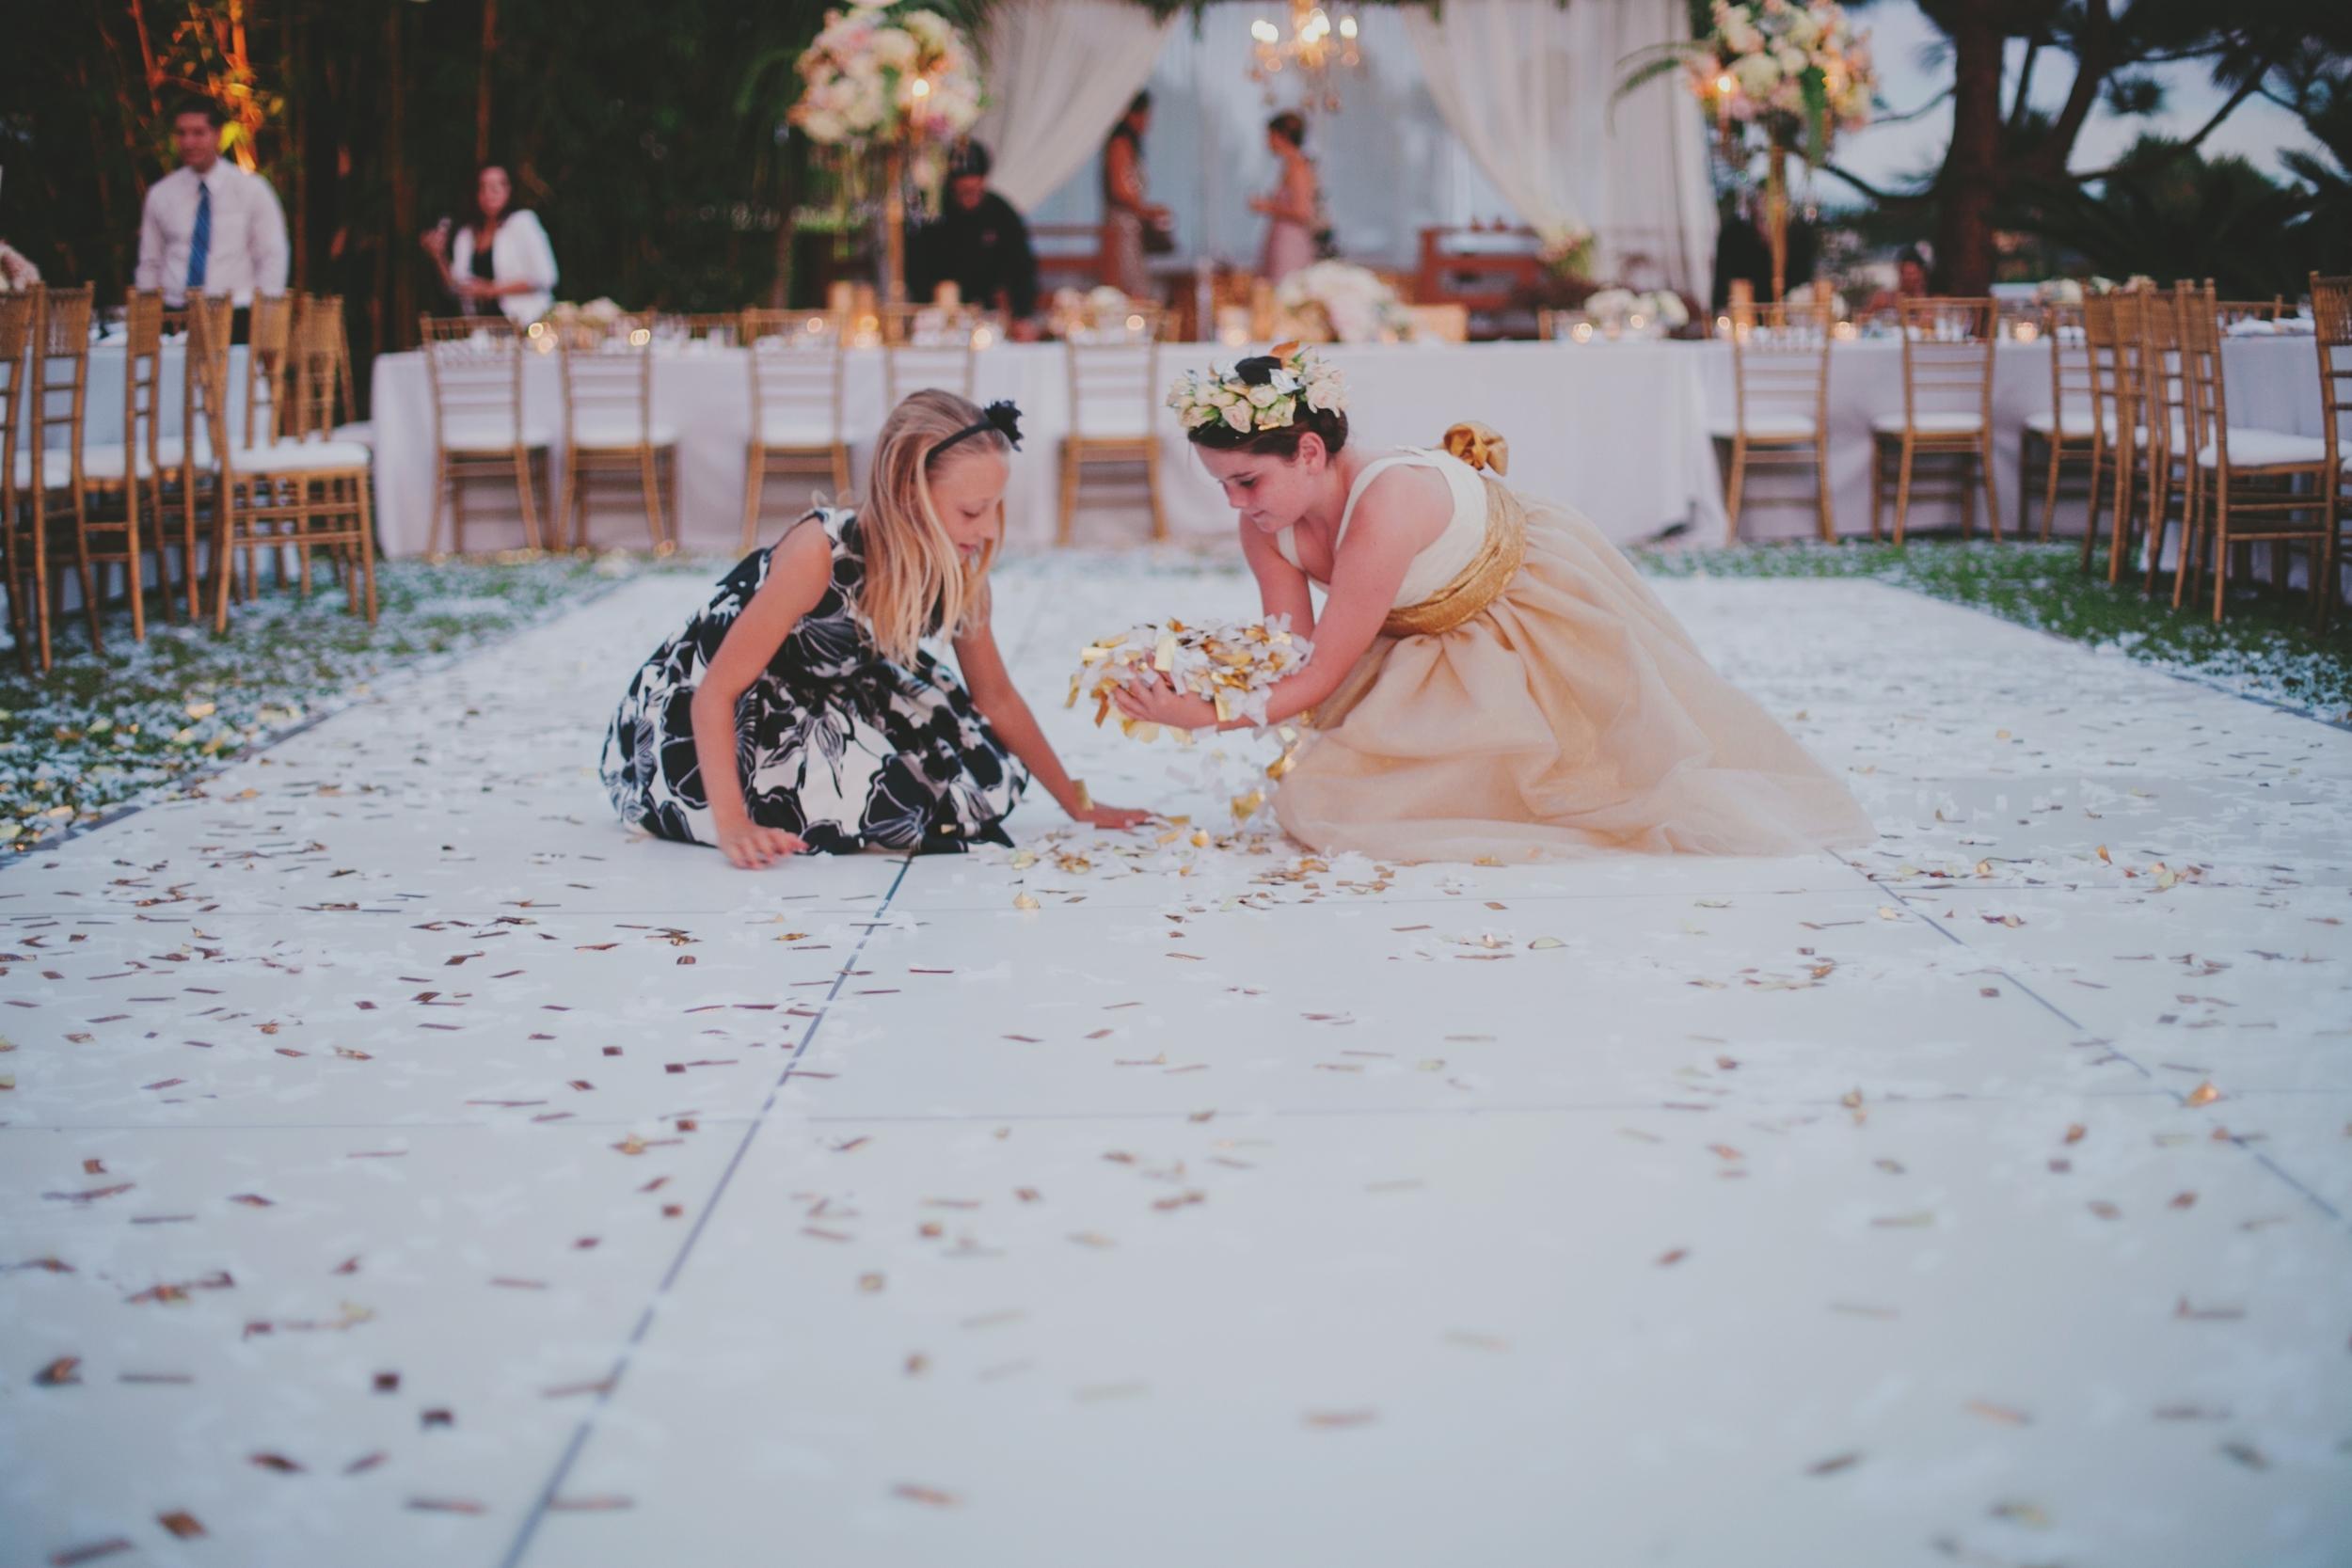 The-Suitcase-Studio-Timree-Matt-Lifestyle-Wedding-Photographer-079.jpg